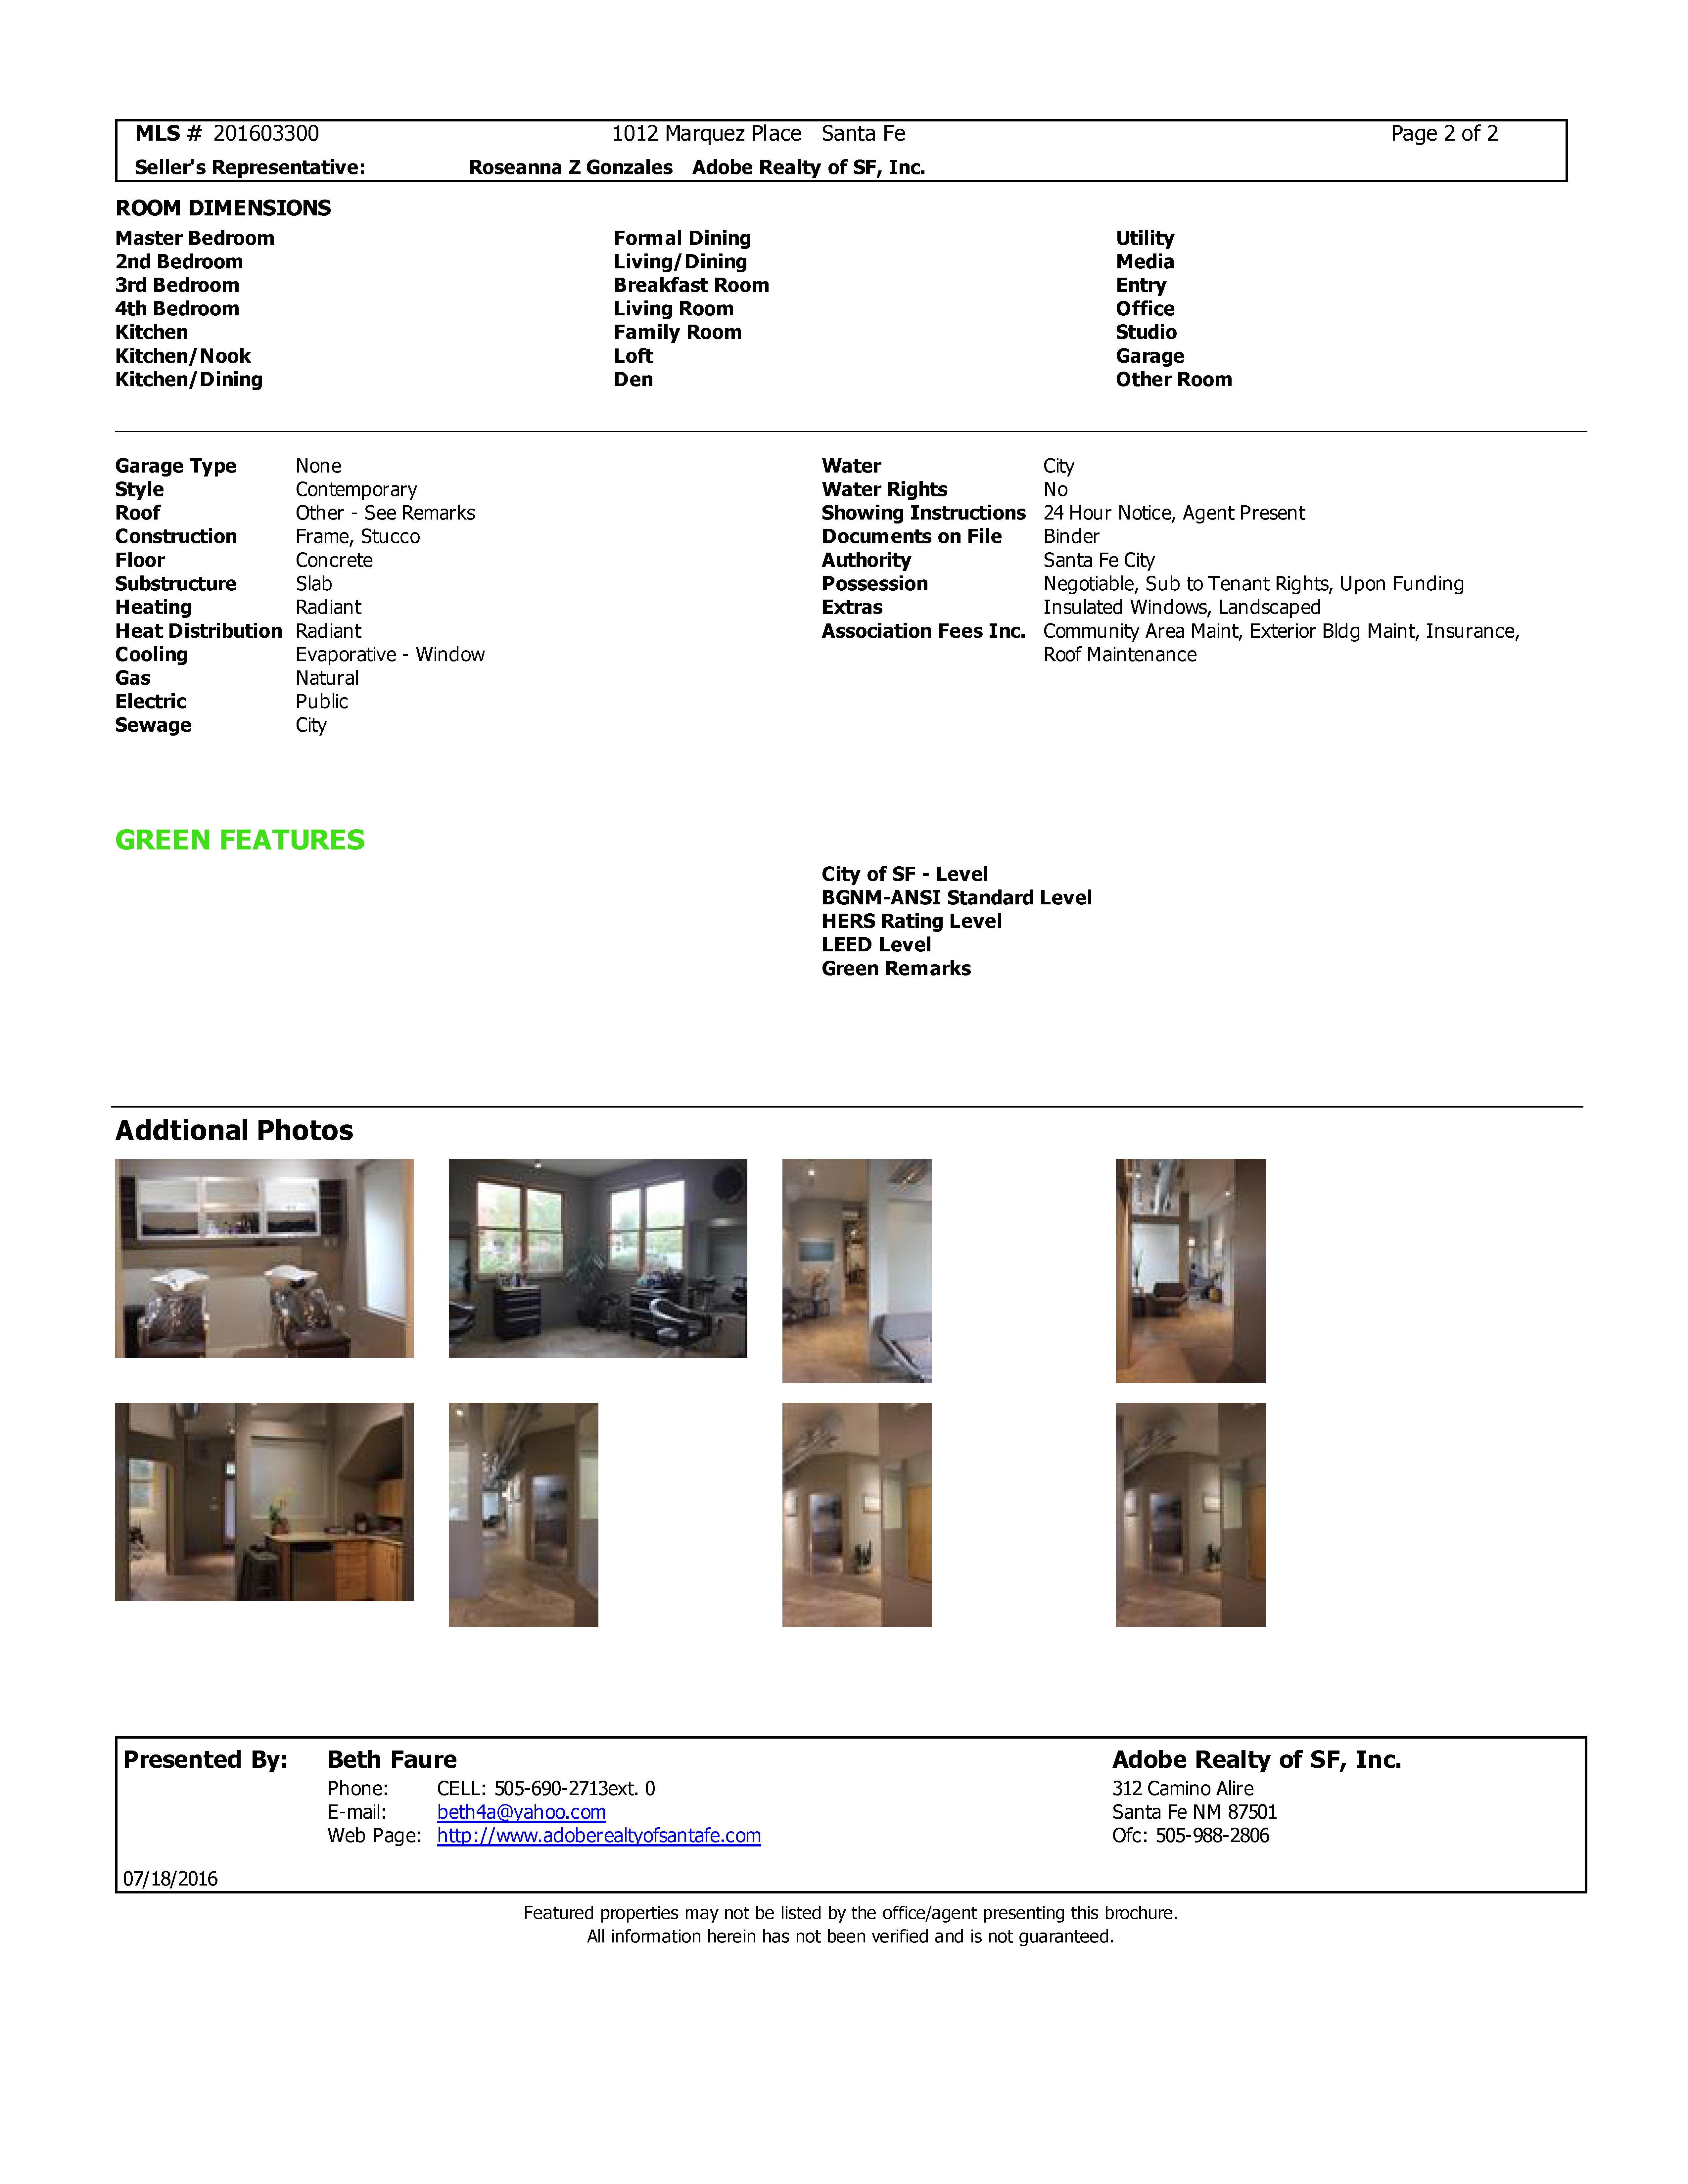 Lofts at Marquez Place_Page_2